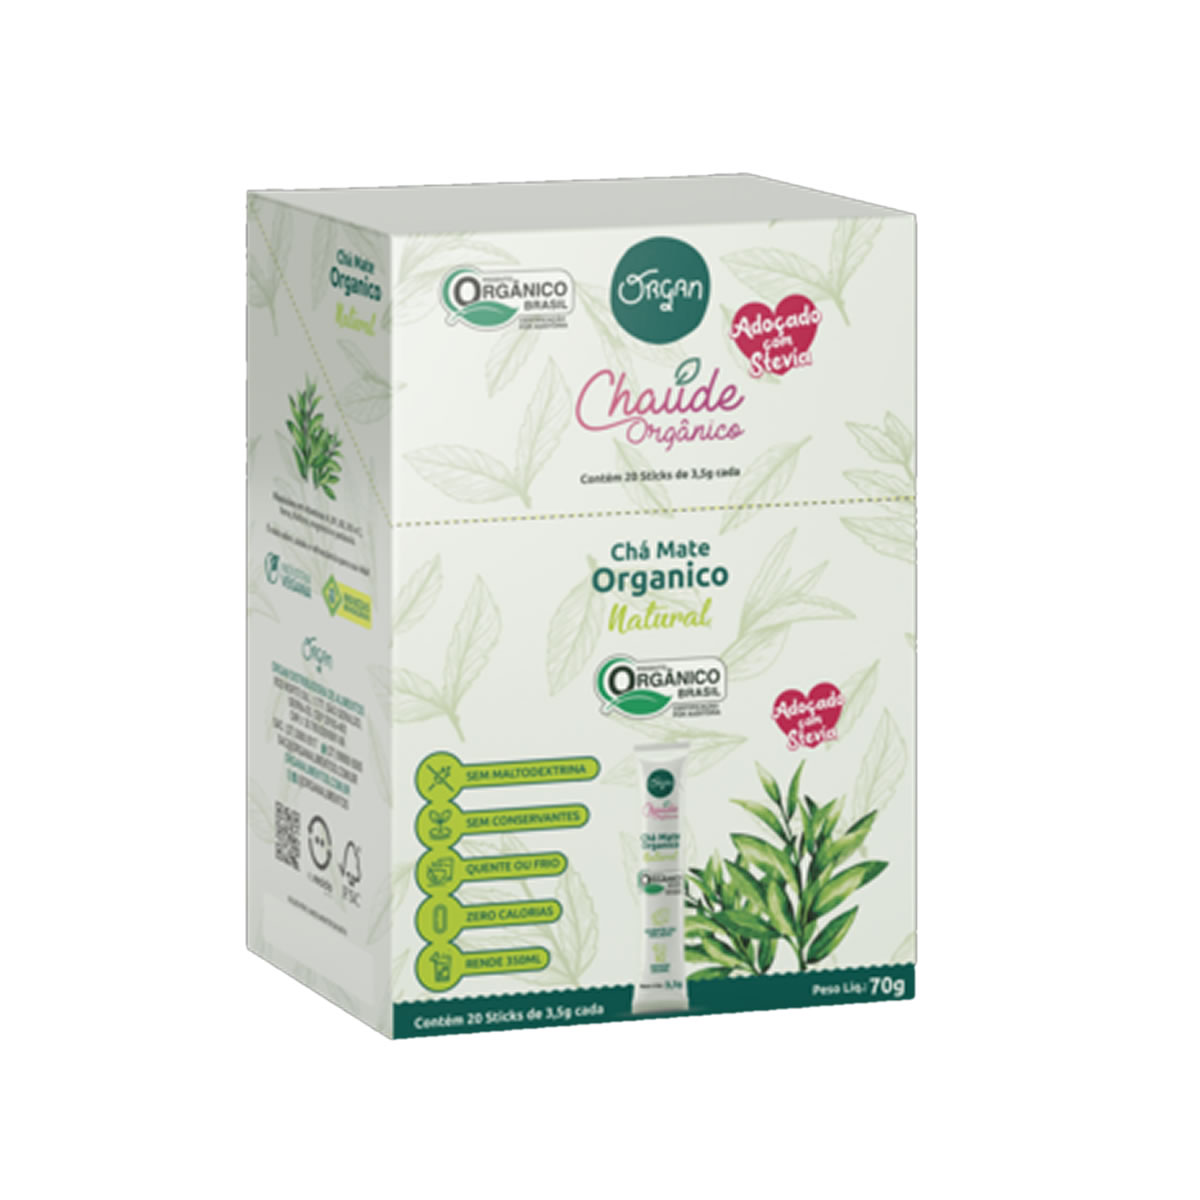 Chá Chaude Orgânico Sabor Natural Display 20un de 3,5g  - Organ